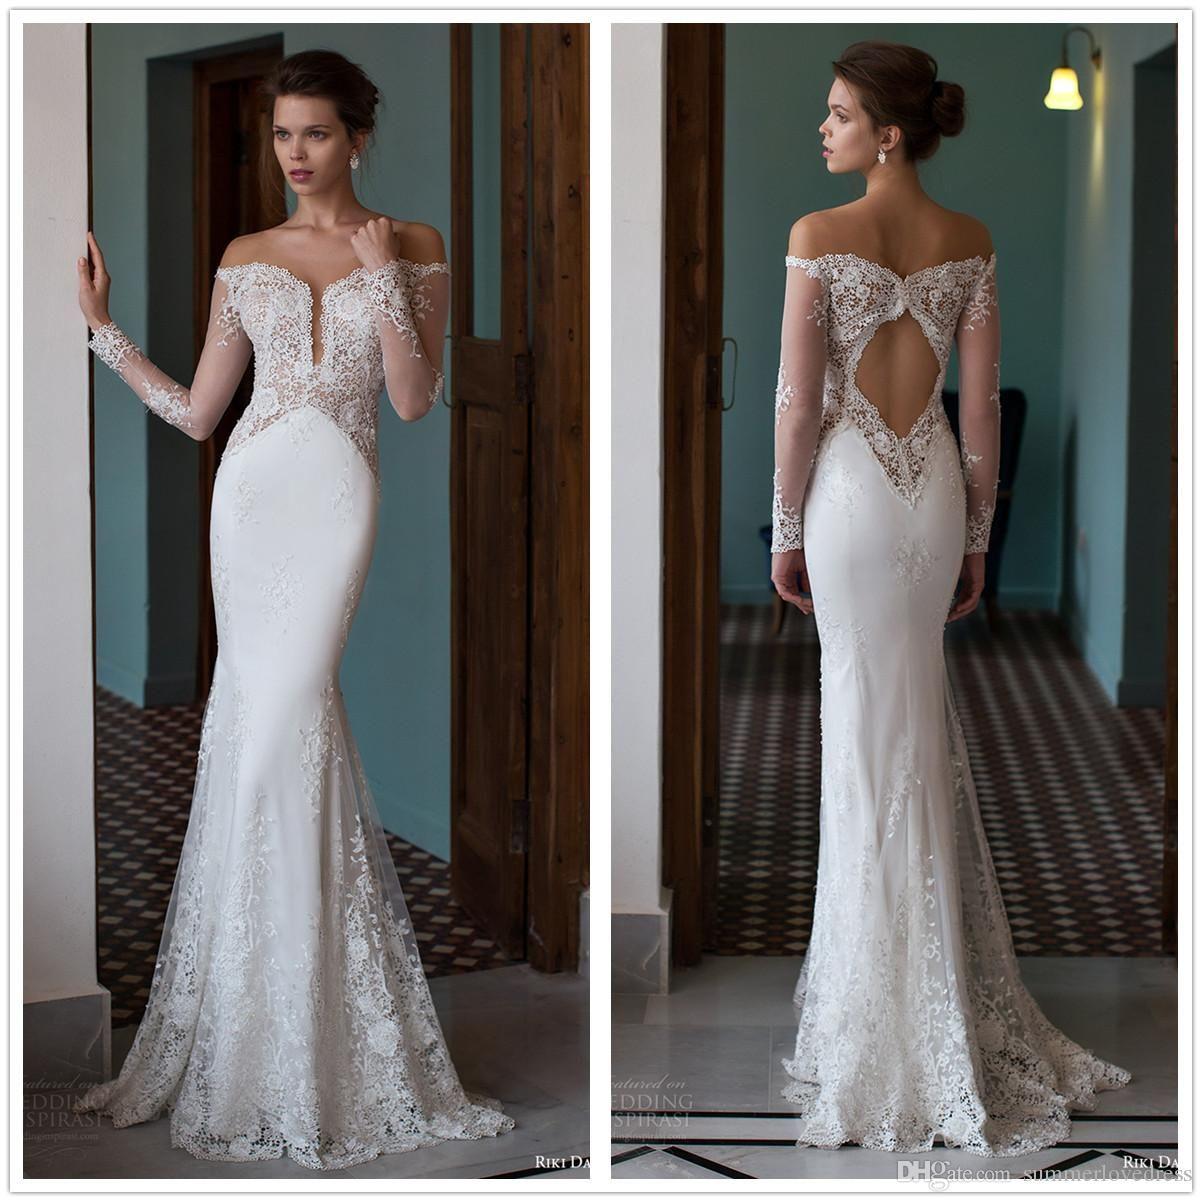 Illusion lace wedding dress  Vintage Illusion Lace Mermaid Wedding Dresses Sheer Long Sleeves